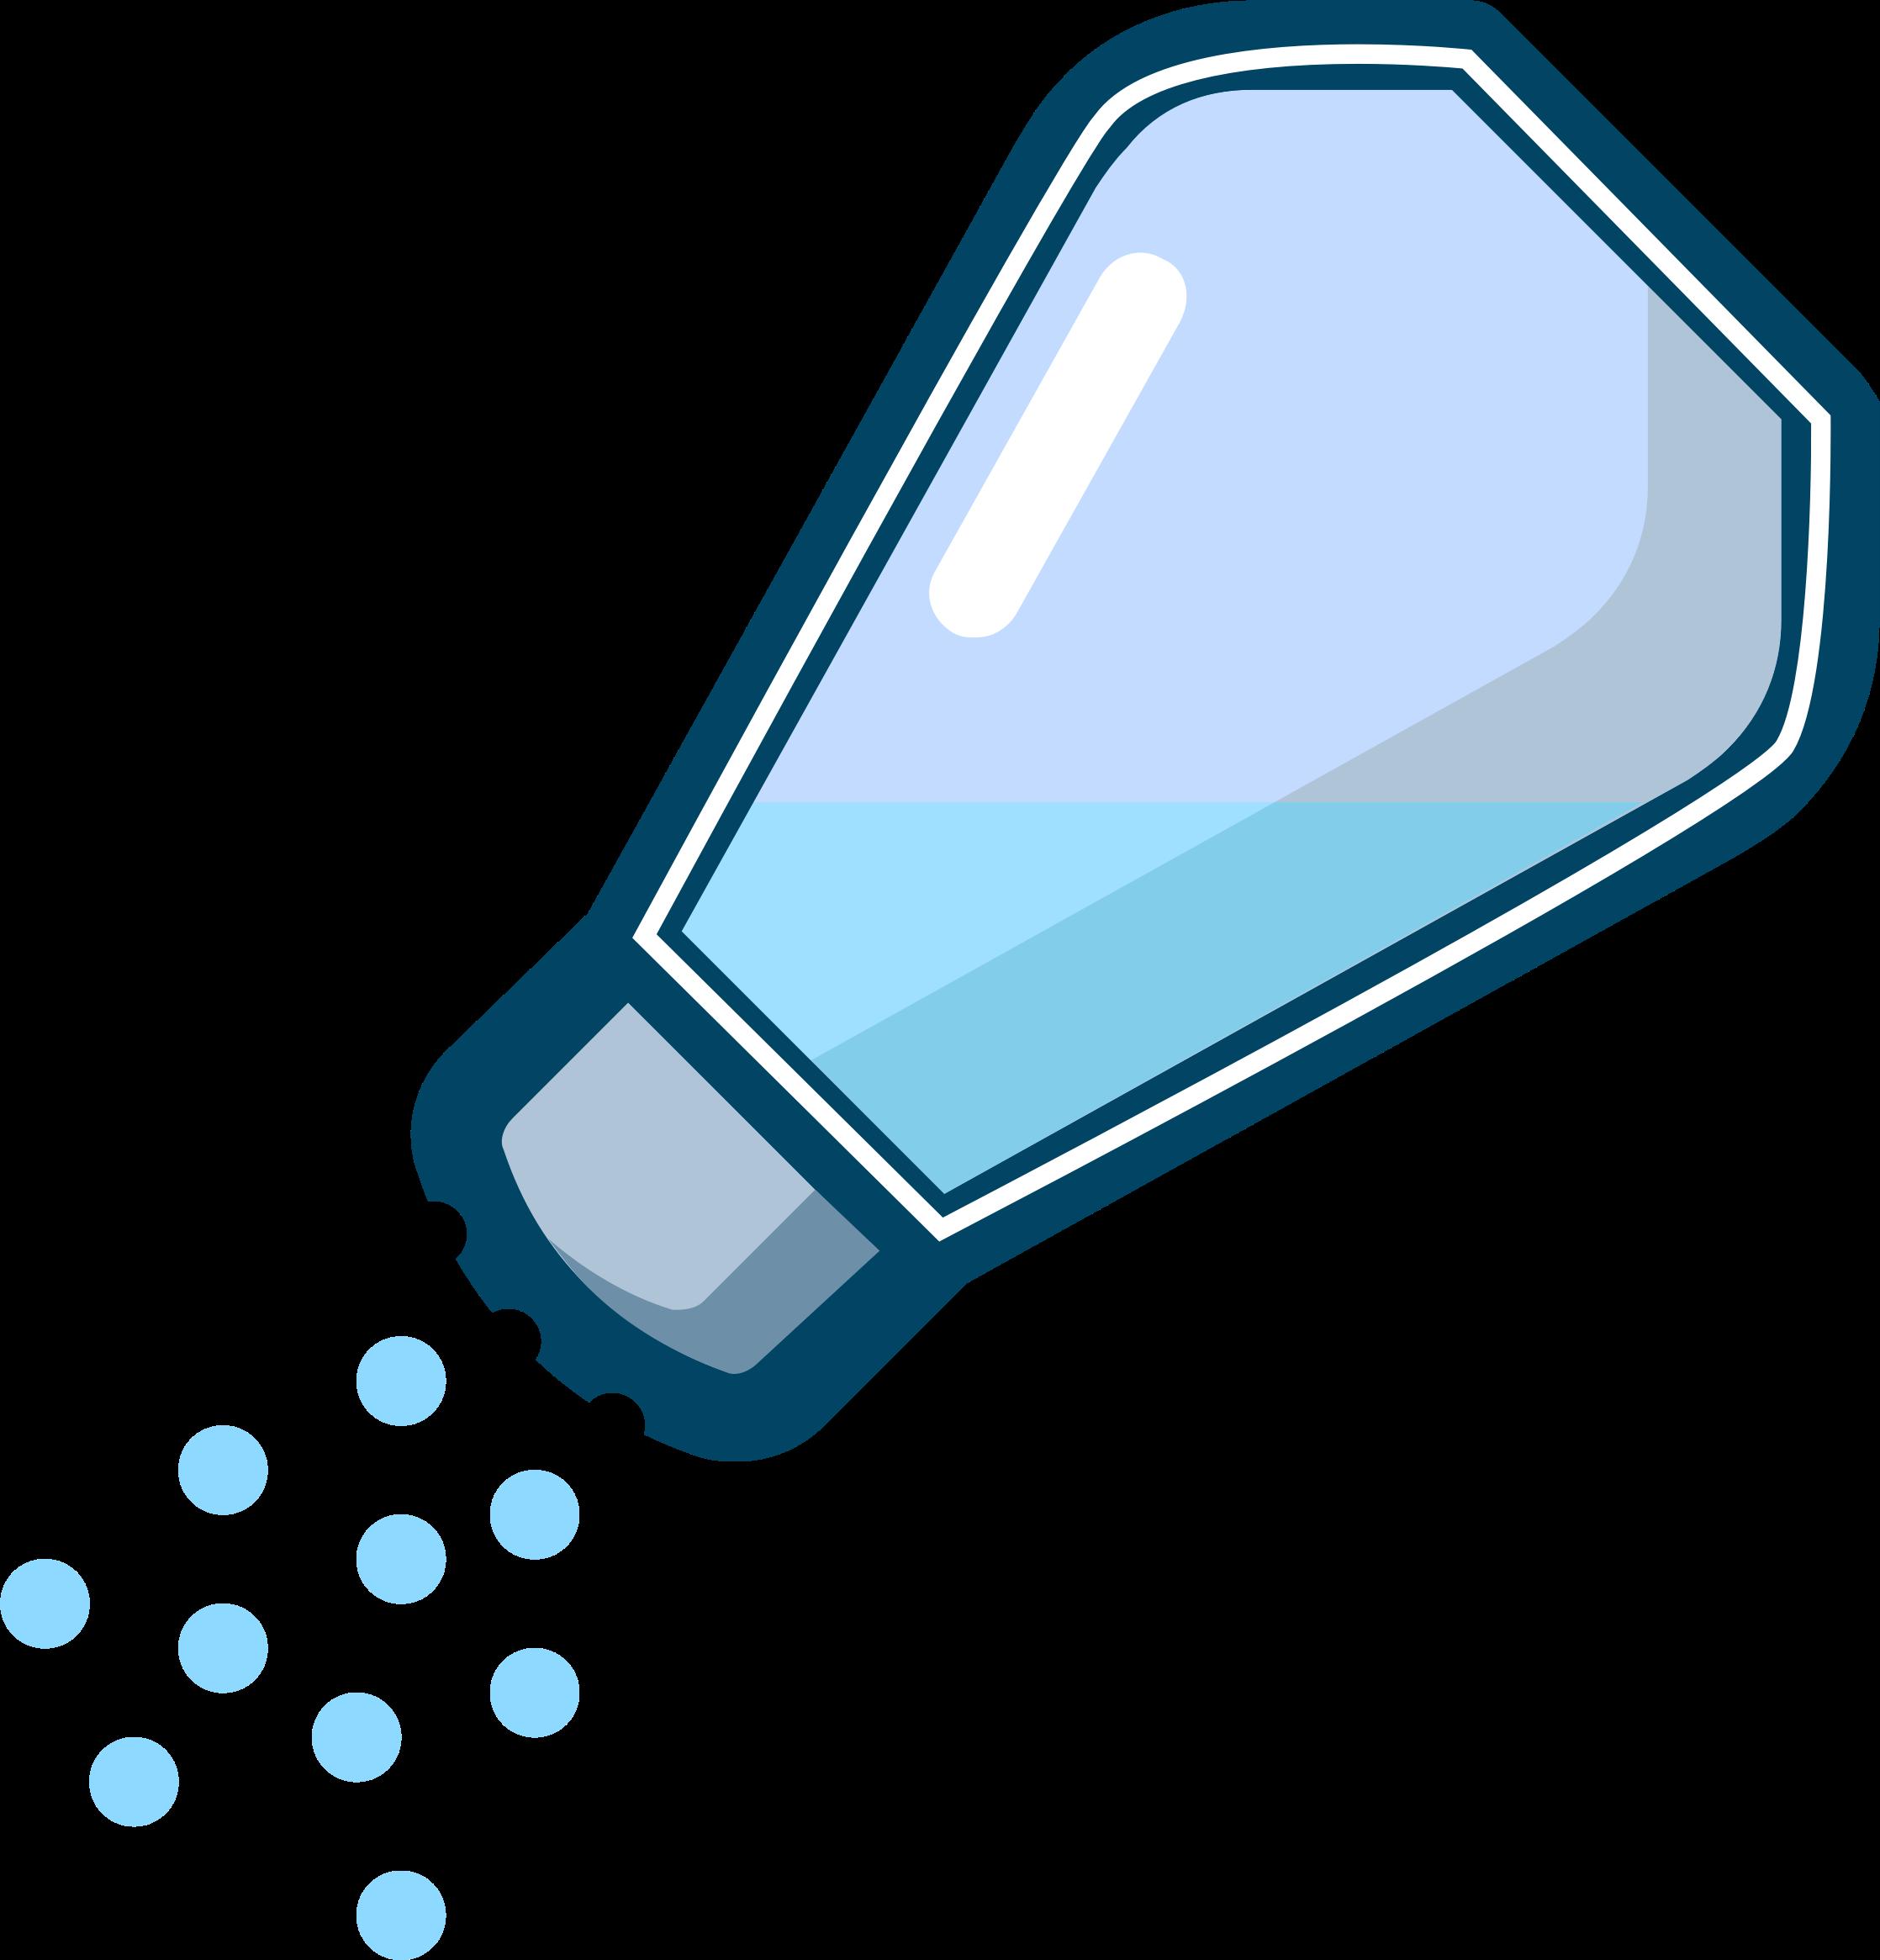 clip art free download Salt clipart. Shaker big image png